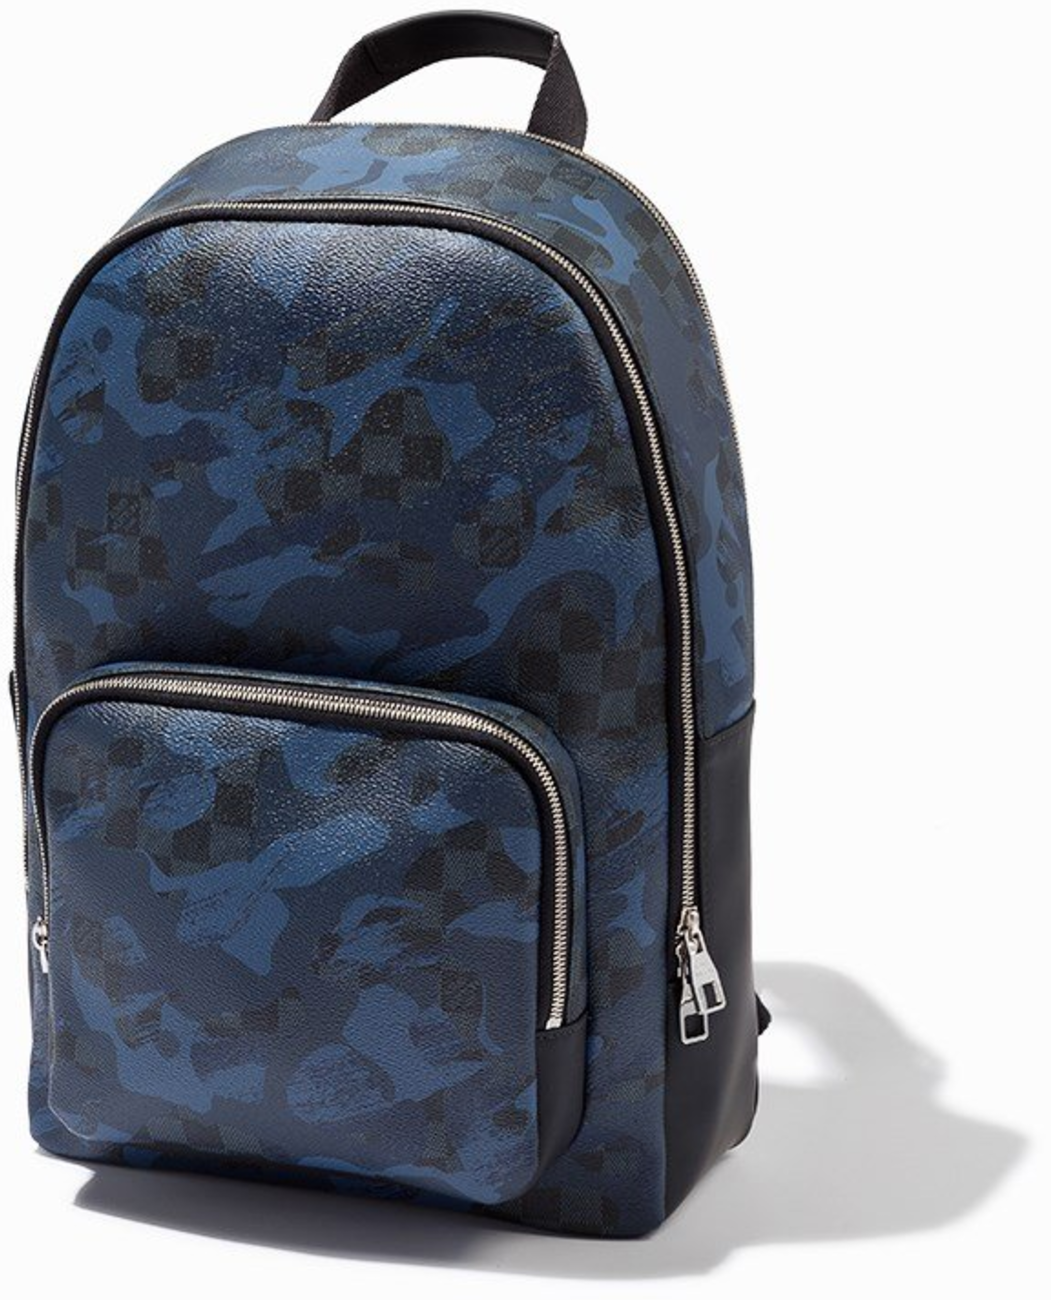 Louis Vuitton Andy Damier Cobalt Bleu Camouflage Blue/Black/Gray